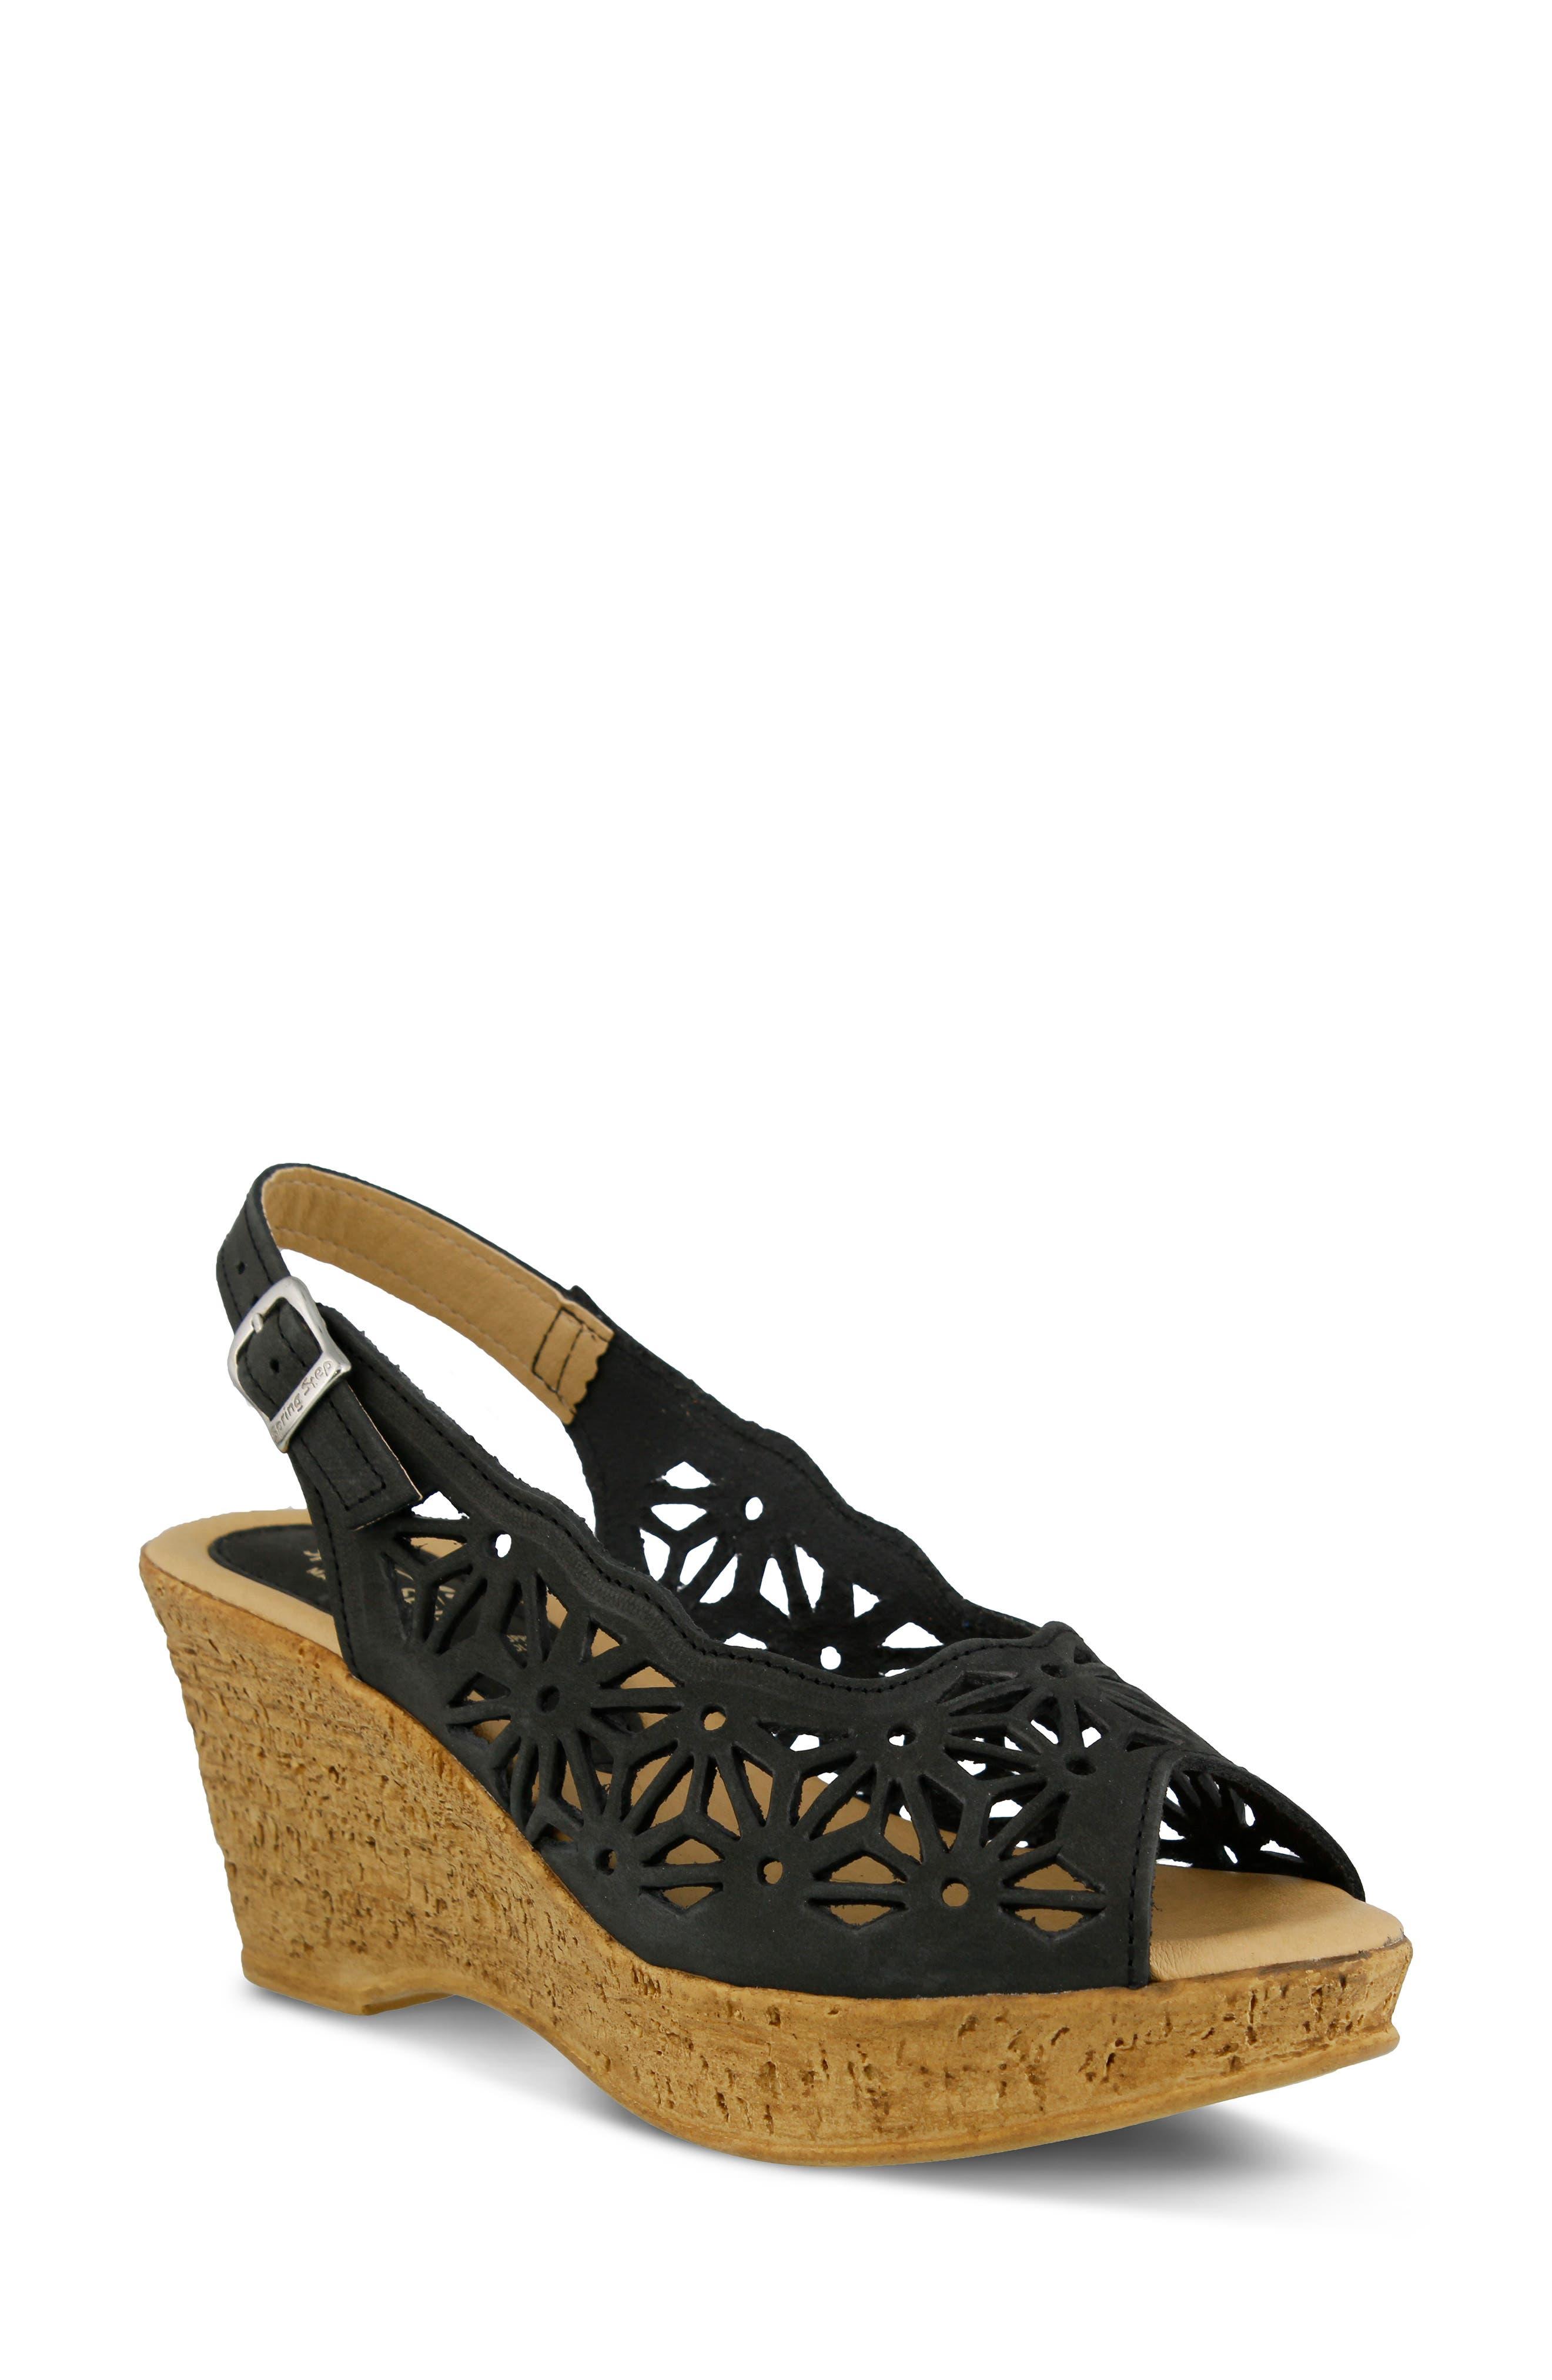 SPRING STEP,                             Abigail Platform Wedge Sandal,                             Main thumbnail 1, color,                             BLACK LEATHER